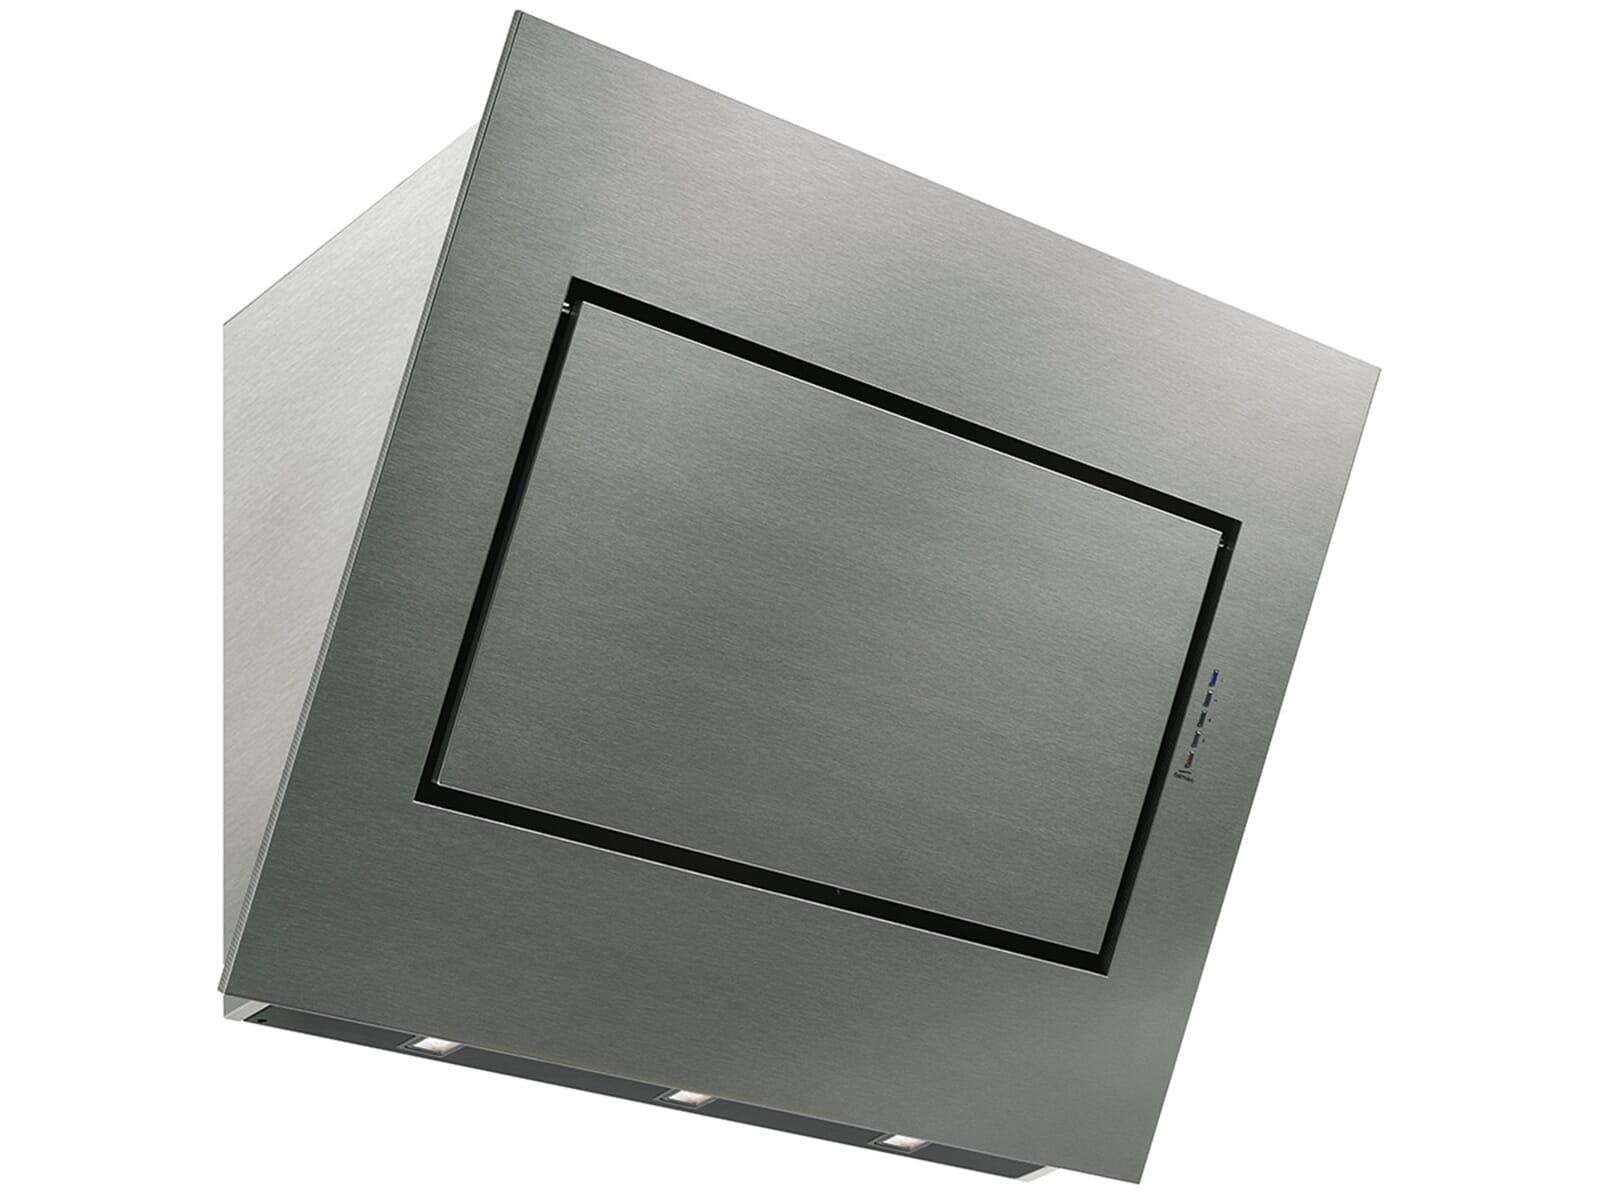 falmec quasar kopffreihaube grau. Black Bedroom Furniture Sets. Home Design Ideas